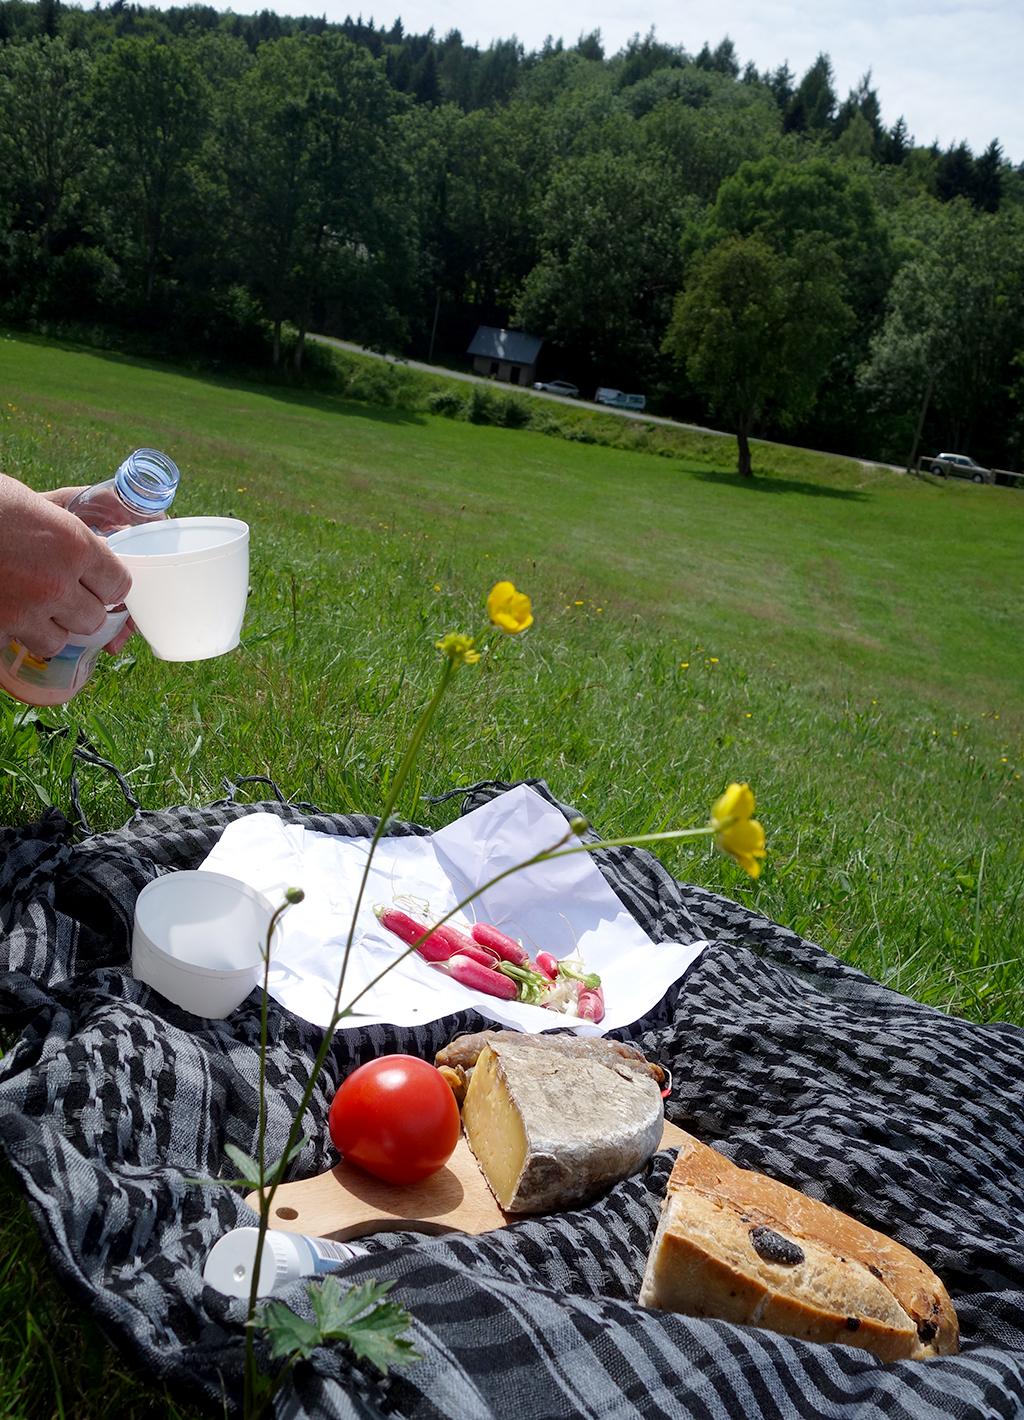 Annecy picnic at Les Puisots